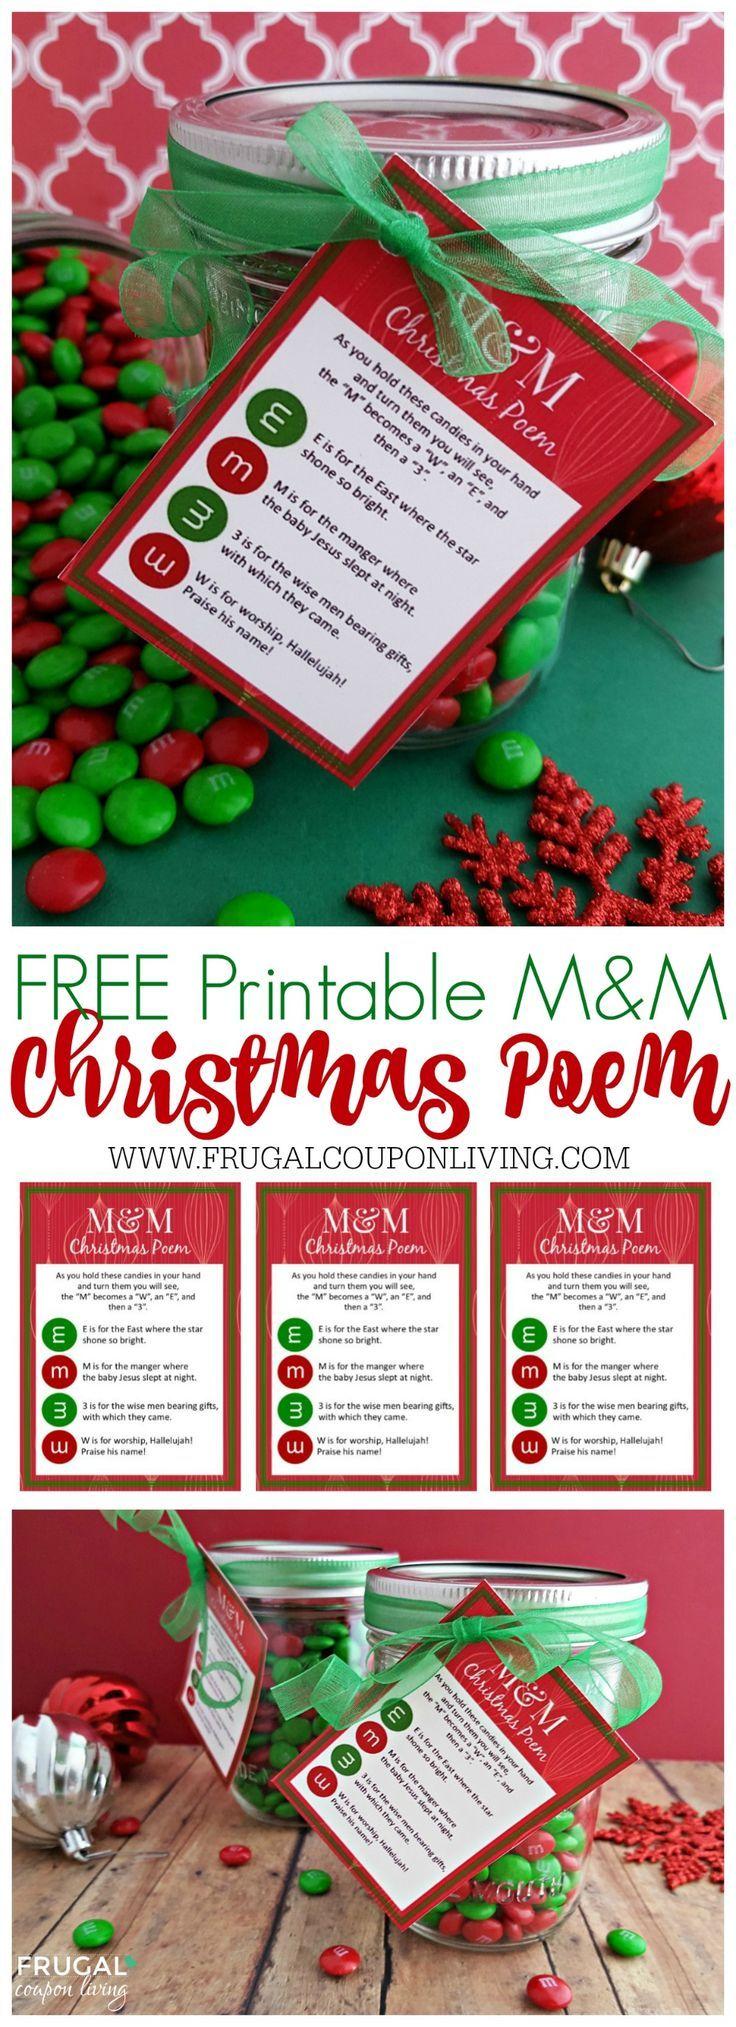 Mason Jar M&M Christmas Poem Printable - DIY Homemade Gift Ideas. #Christmas #pr...